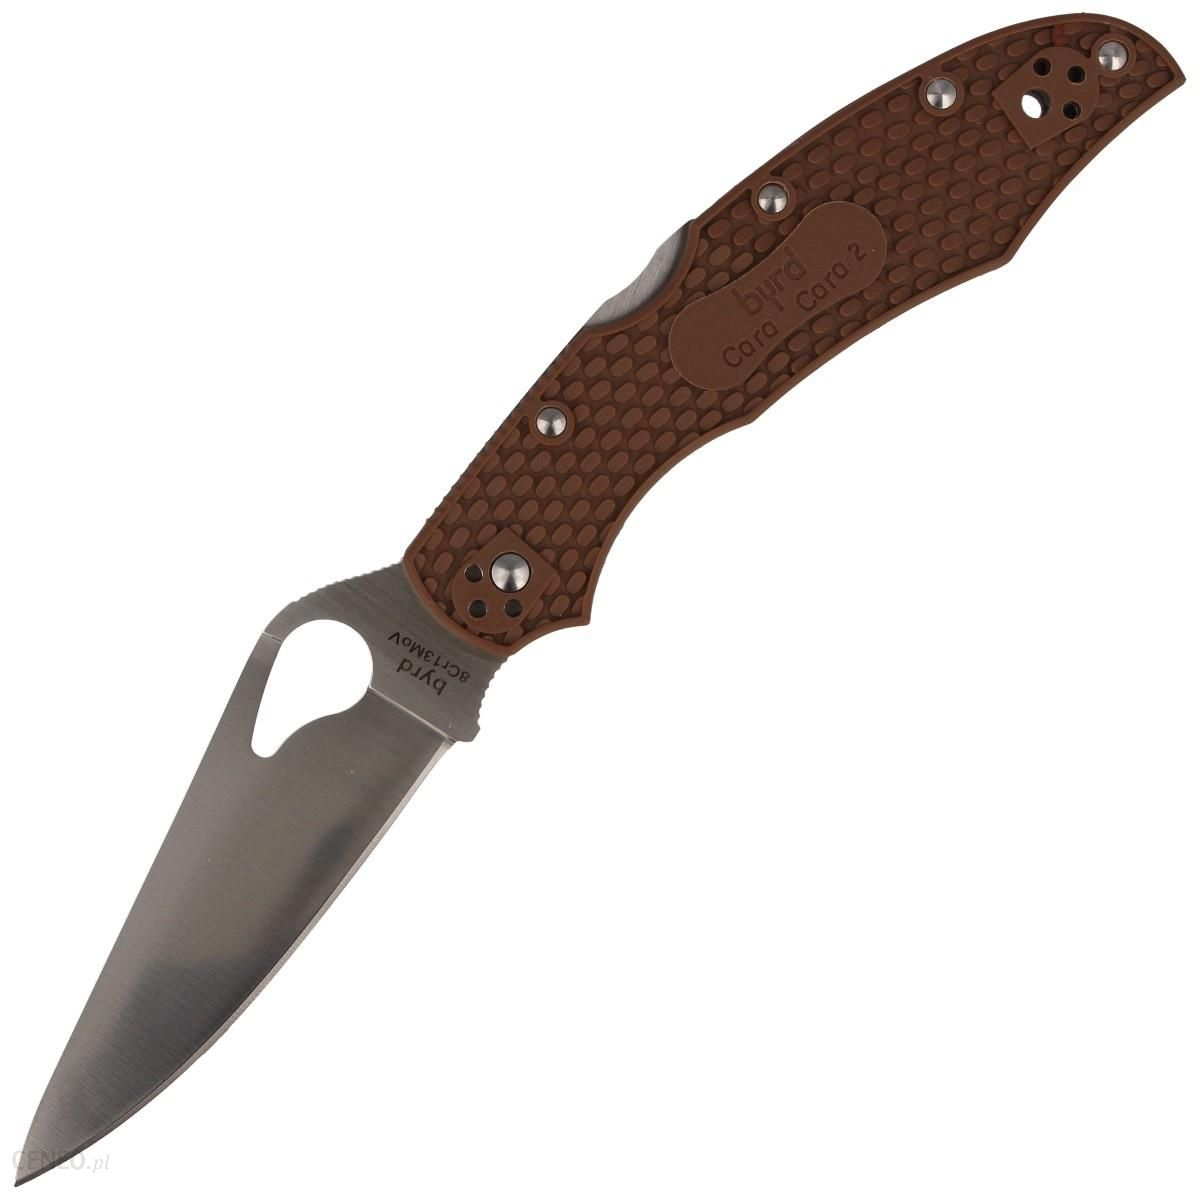 Spyderco Nóż Byrd Cara Cara 2 Brown Frn Plain (By03Pbn2)